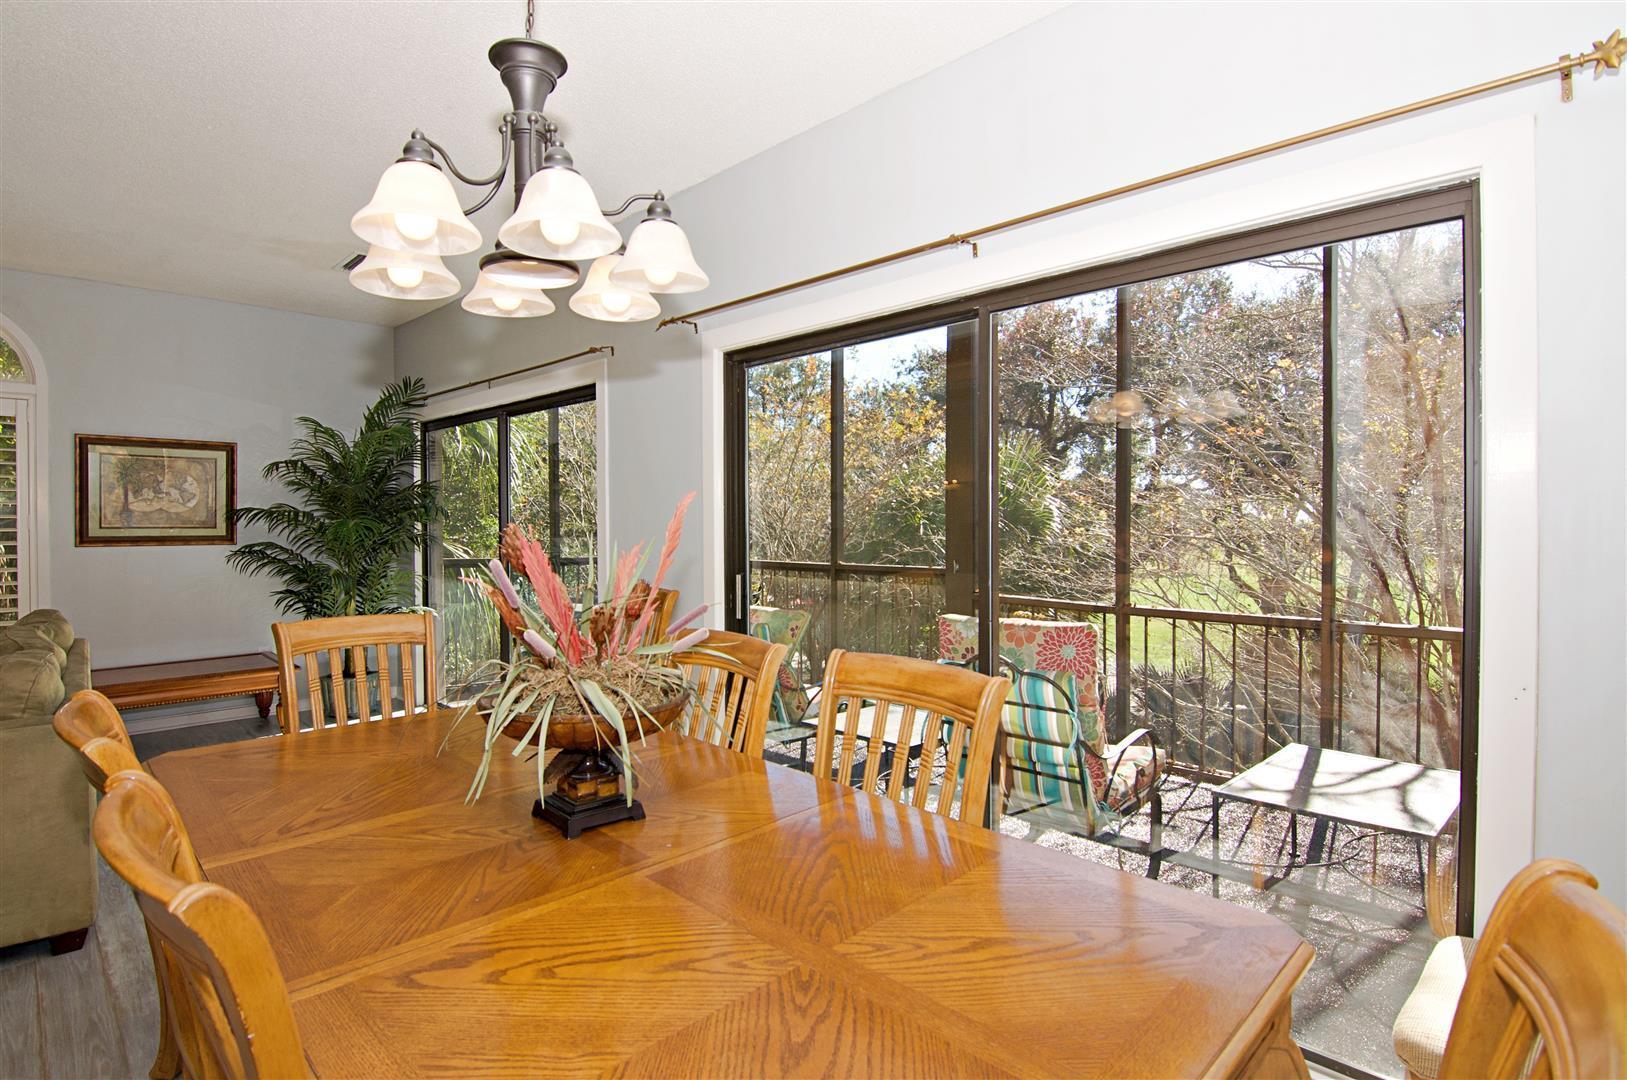 Seabrook Island Homes For Sale - 3020 Ocean Winds, Seabrook Island, SC - 35